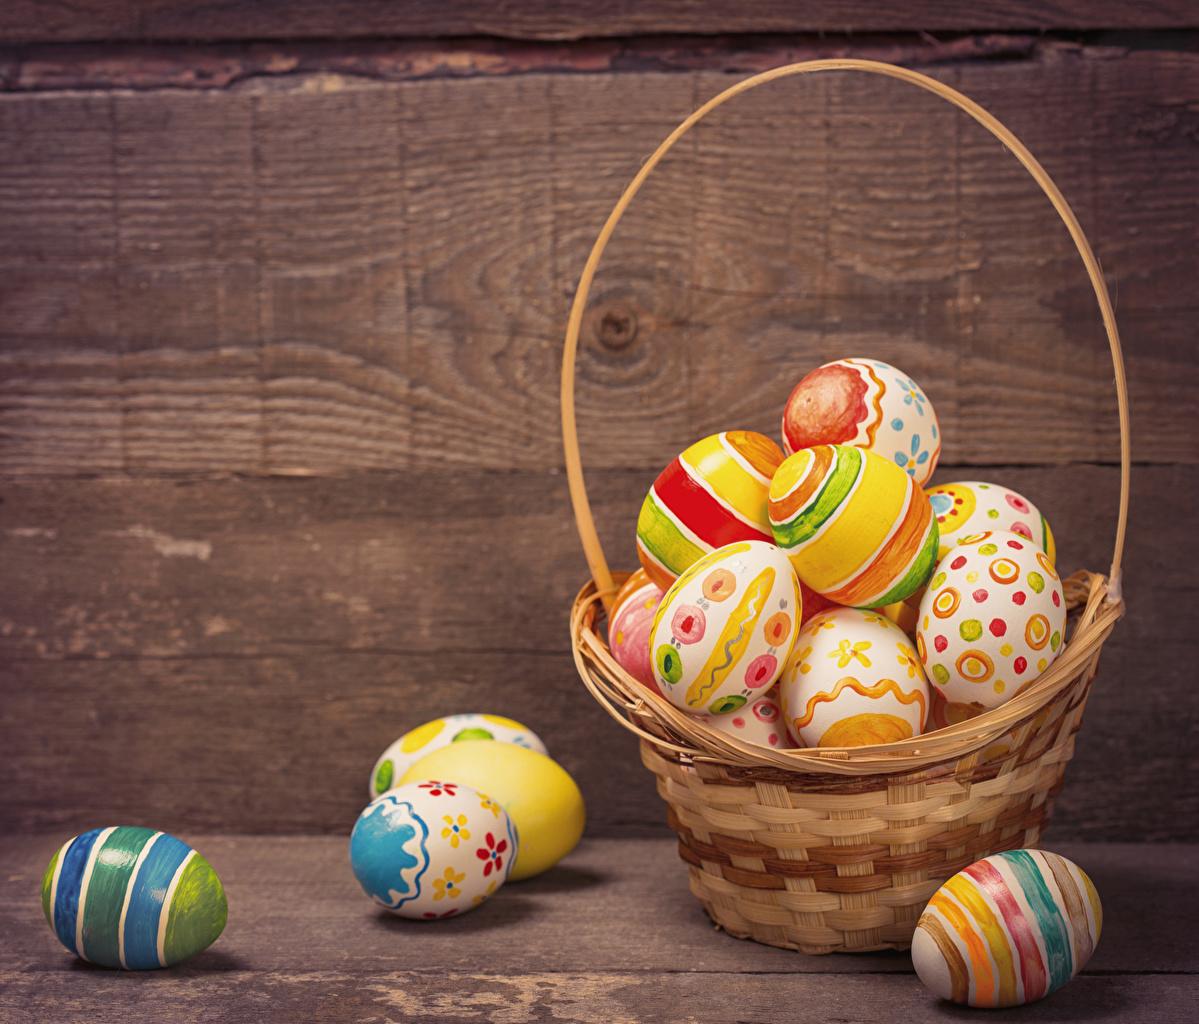 Wallpaper Easter Eggs Wicker basket Holidays Wood planks 1199x1024